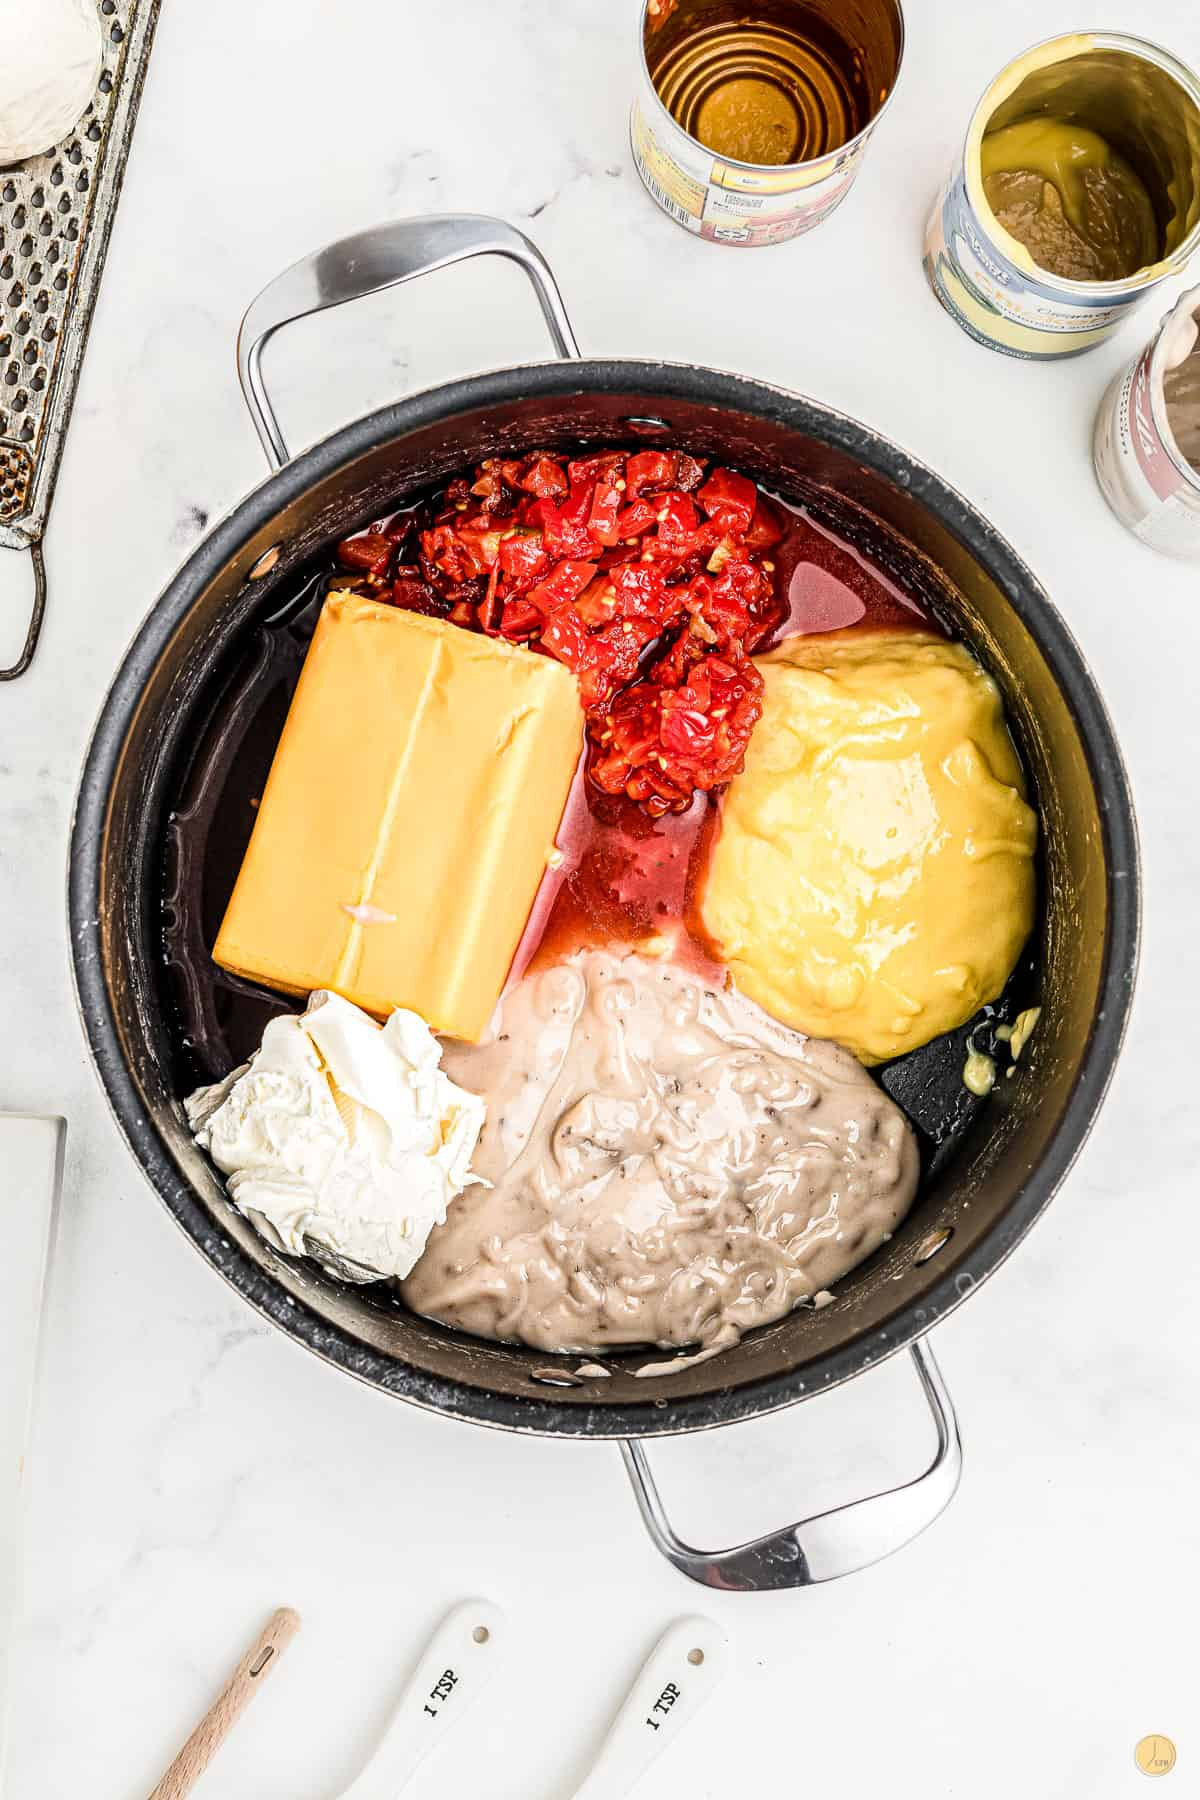 velveeta and soup in a pot